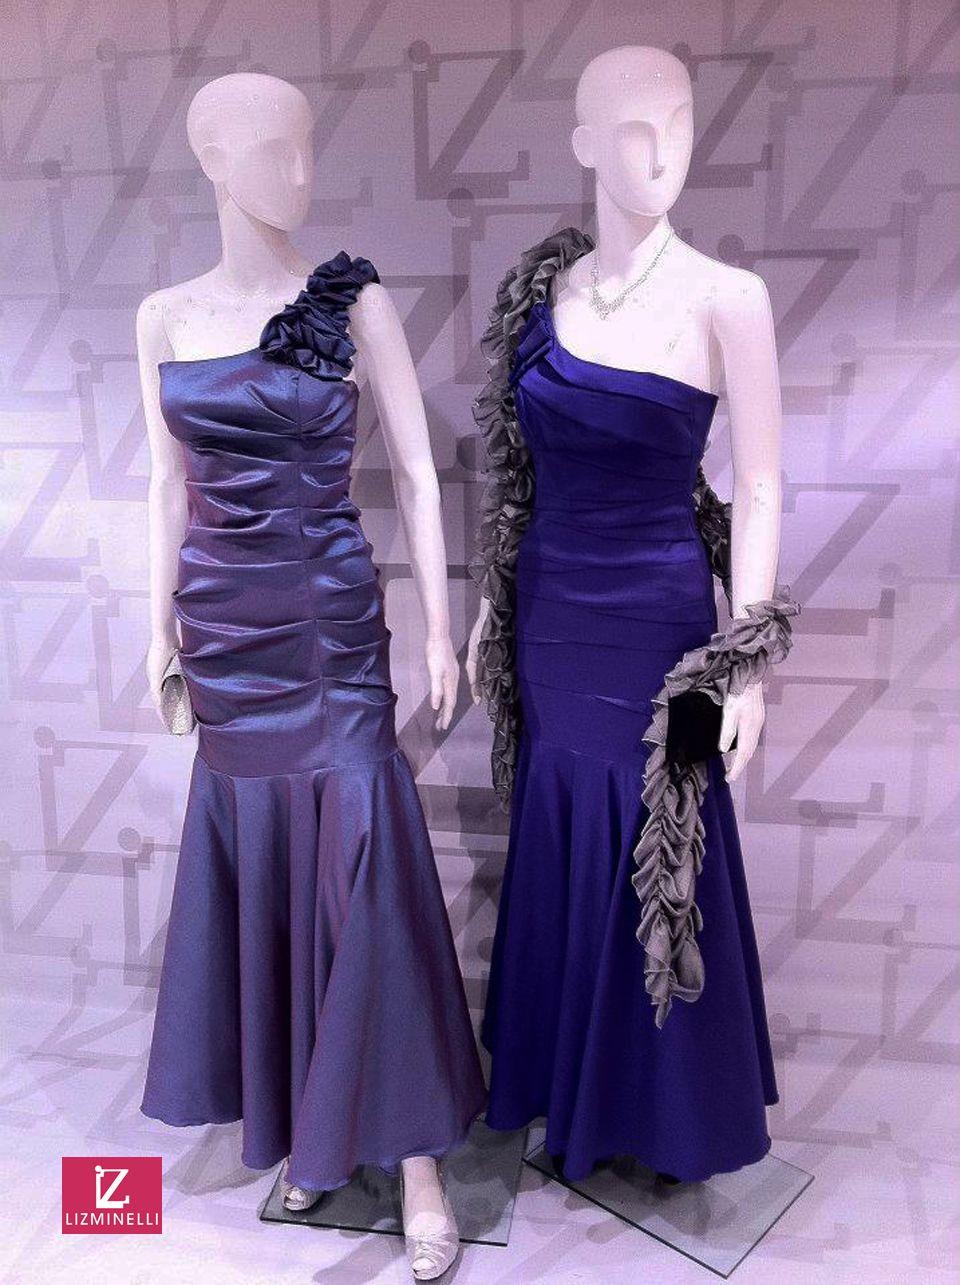 CONJUNTO IZQUIERDA: Vestido Modelo 1cl00571 / Zapatos Plata Modelo ...